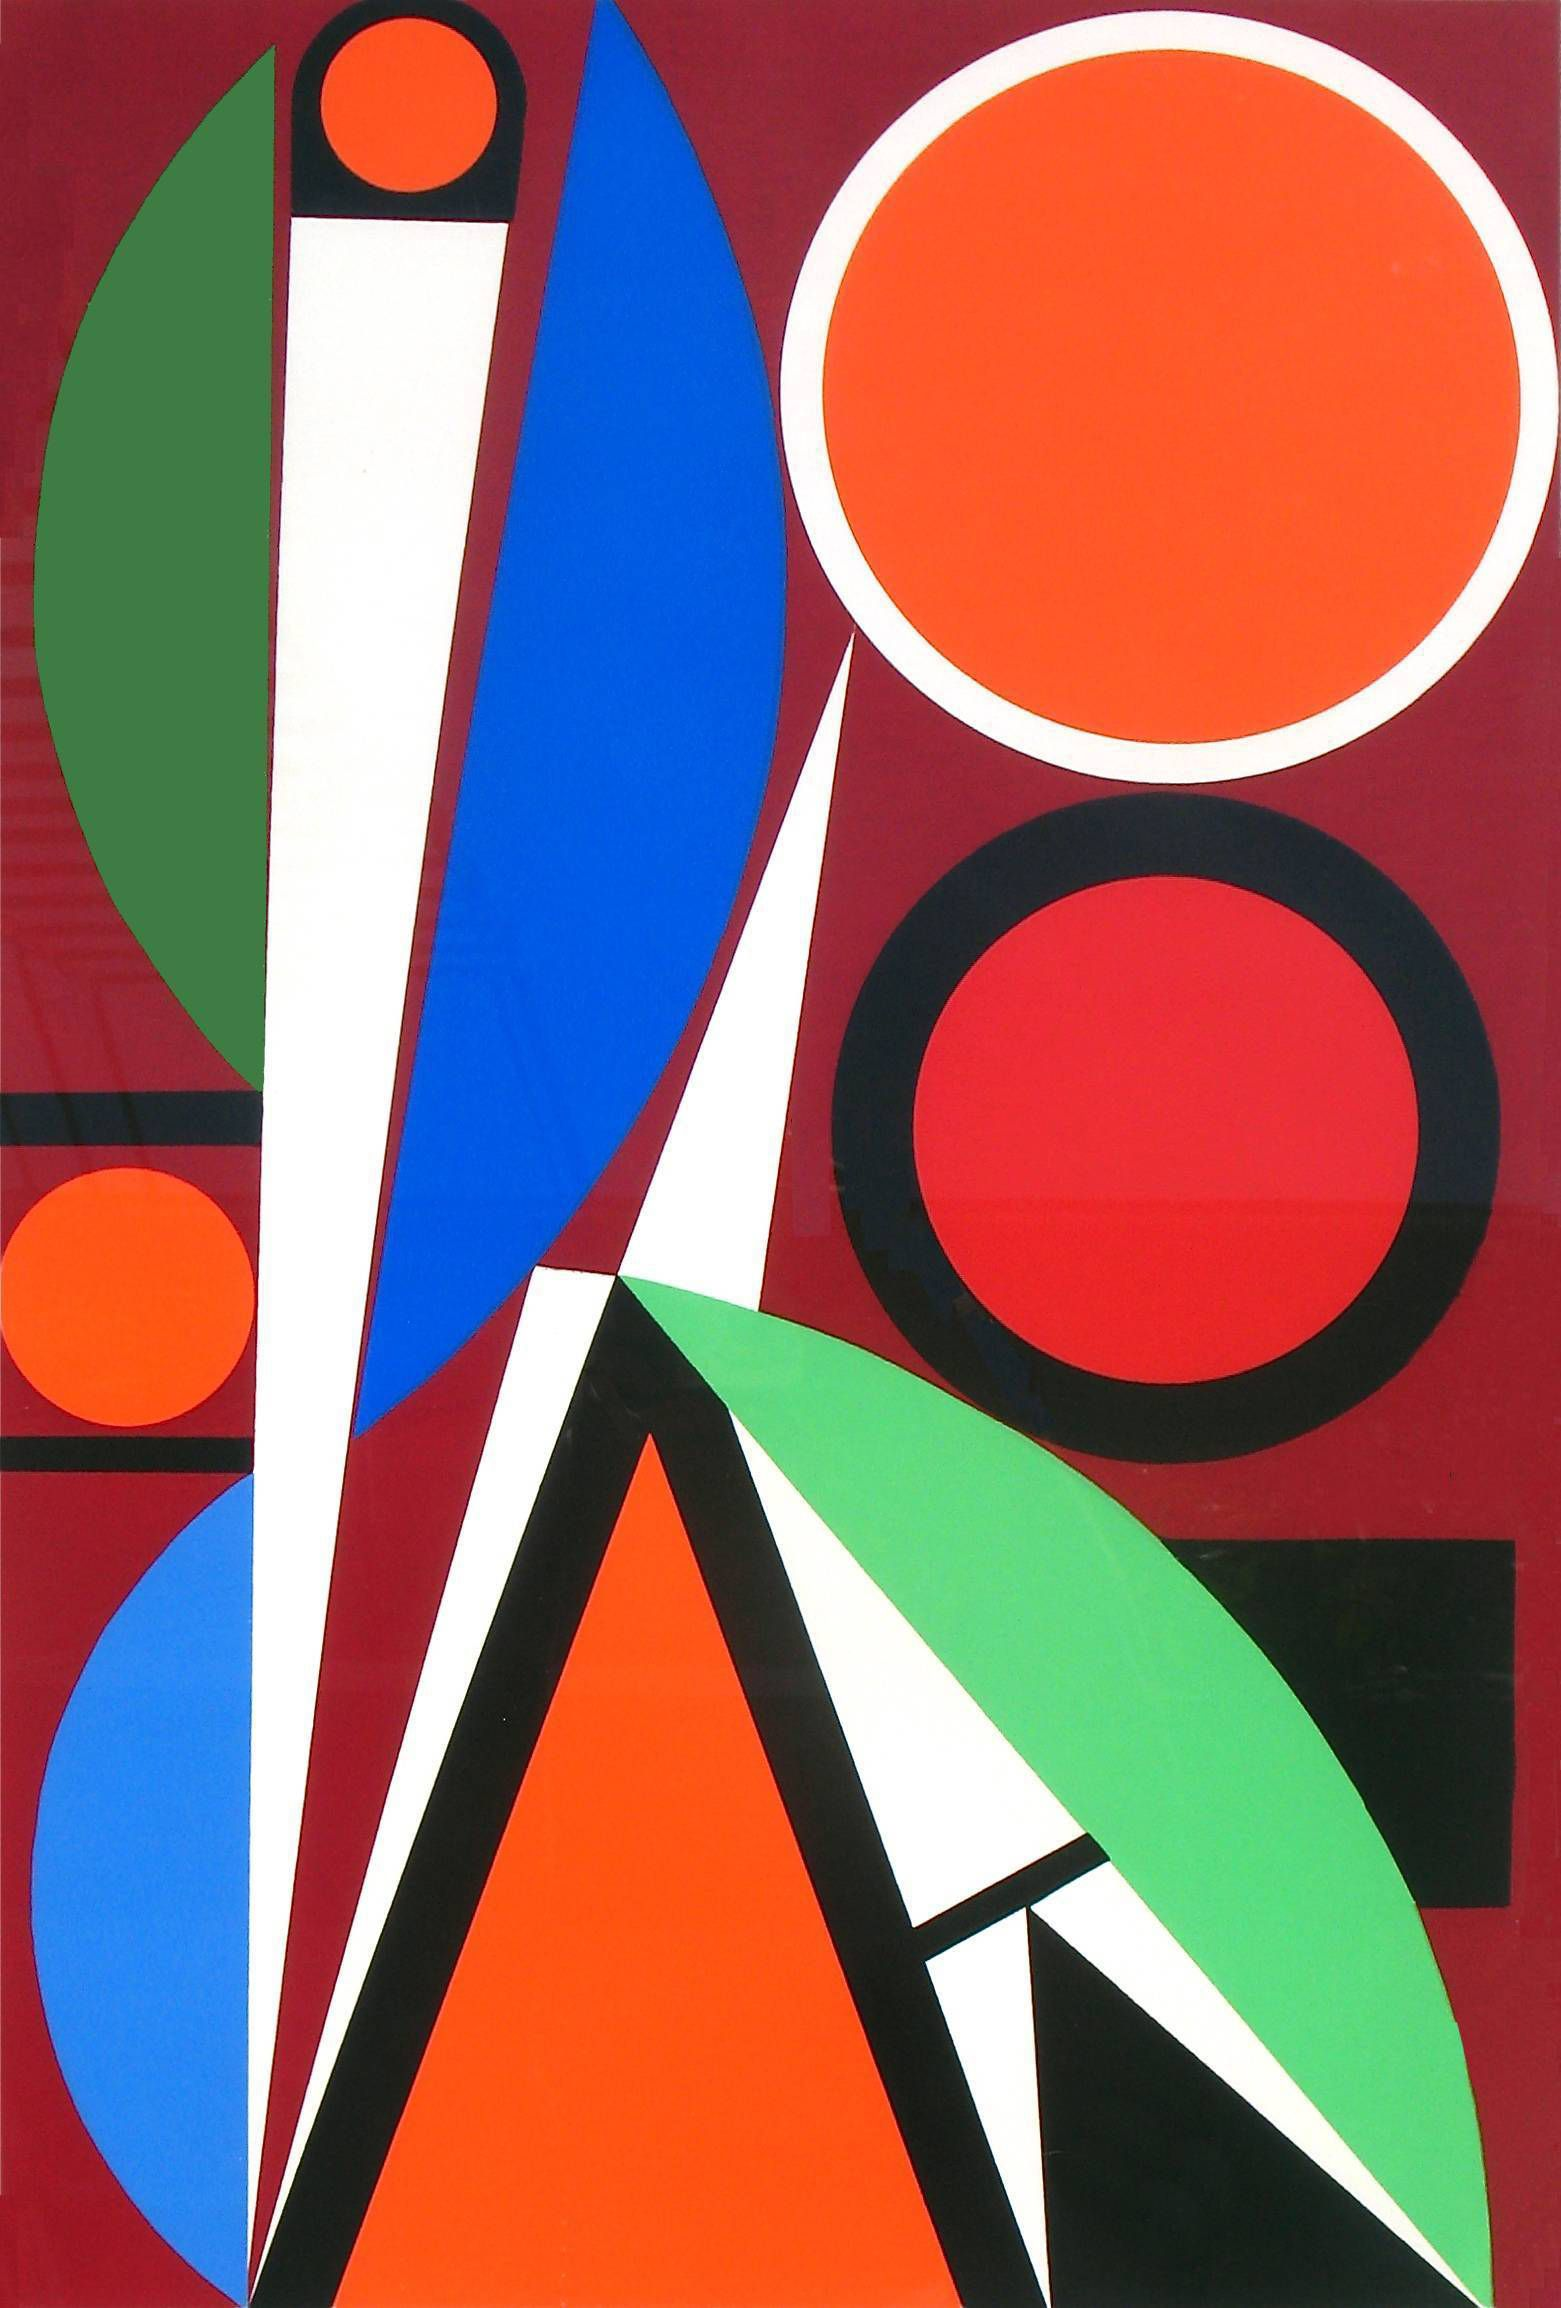 siebdruck andreas ostler art consultant geometrische malerei abstrakte kunst bilder acryl abstrakt